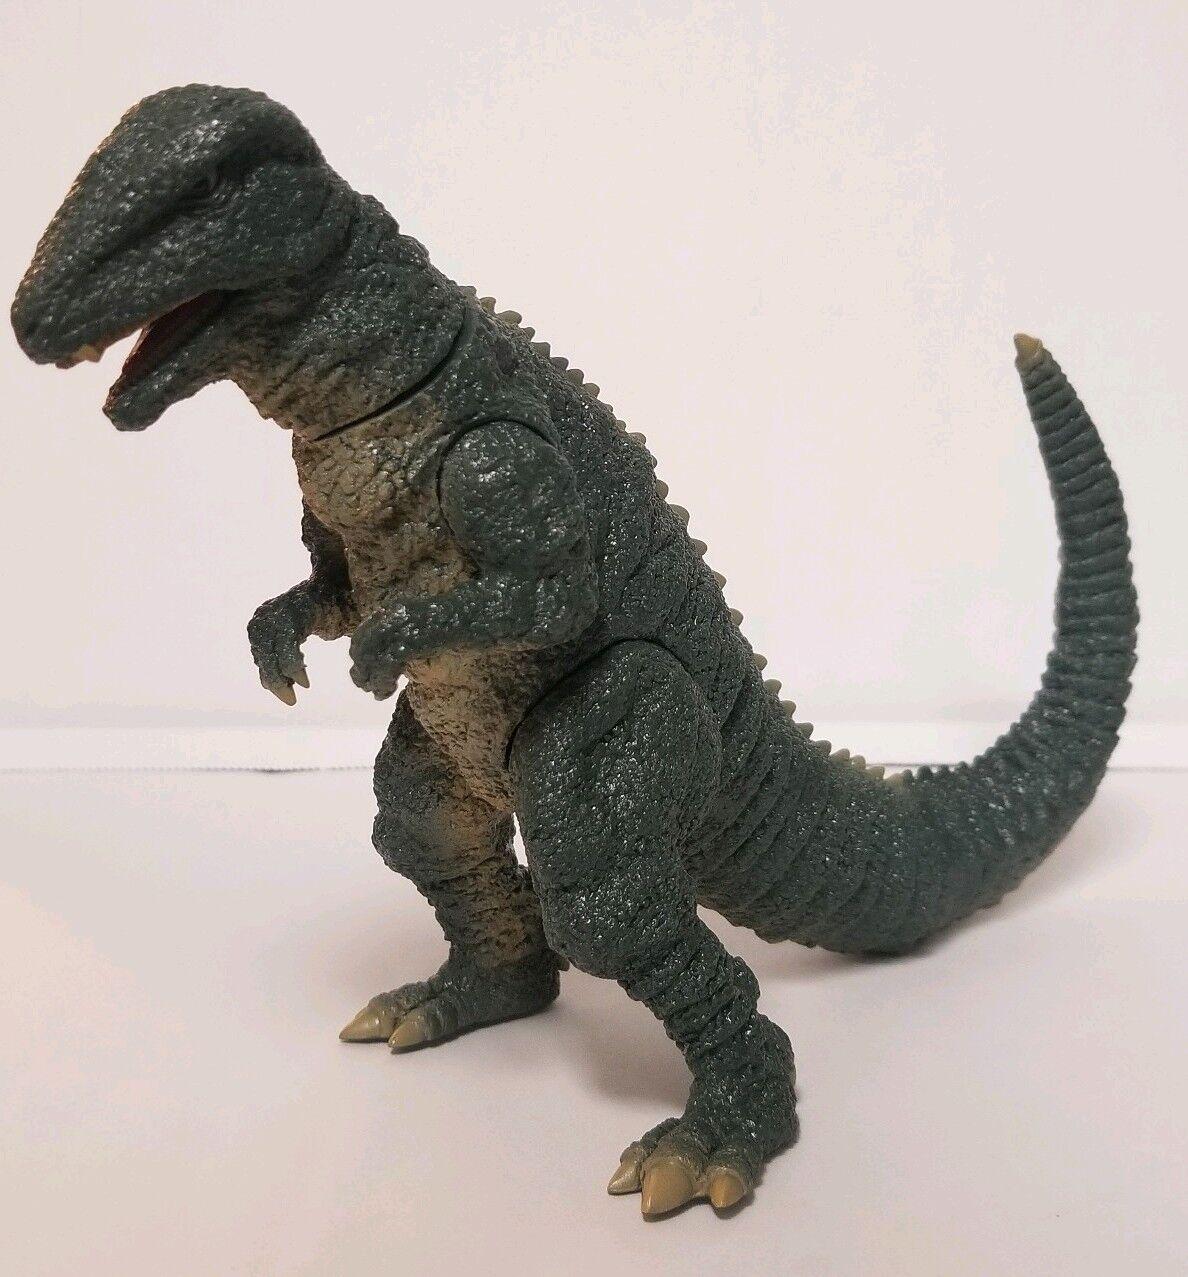 Godzilla Y-MSF GOpinkURUS 6 inch figure rare GREEN OPEN mouth version